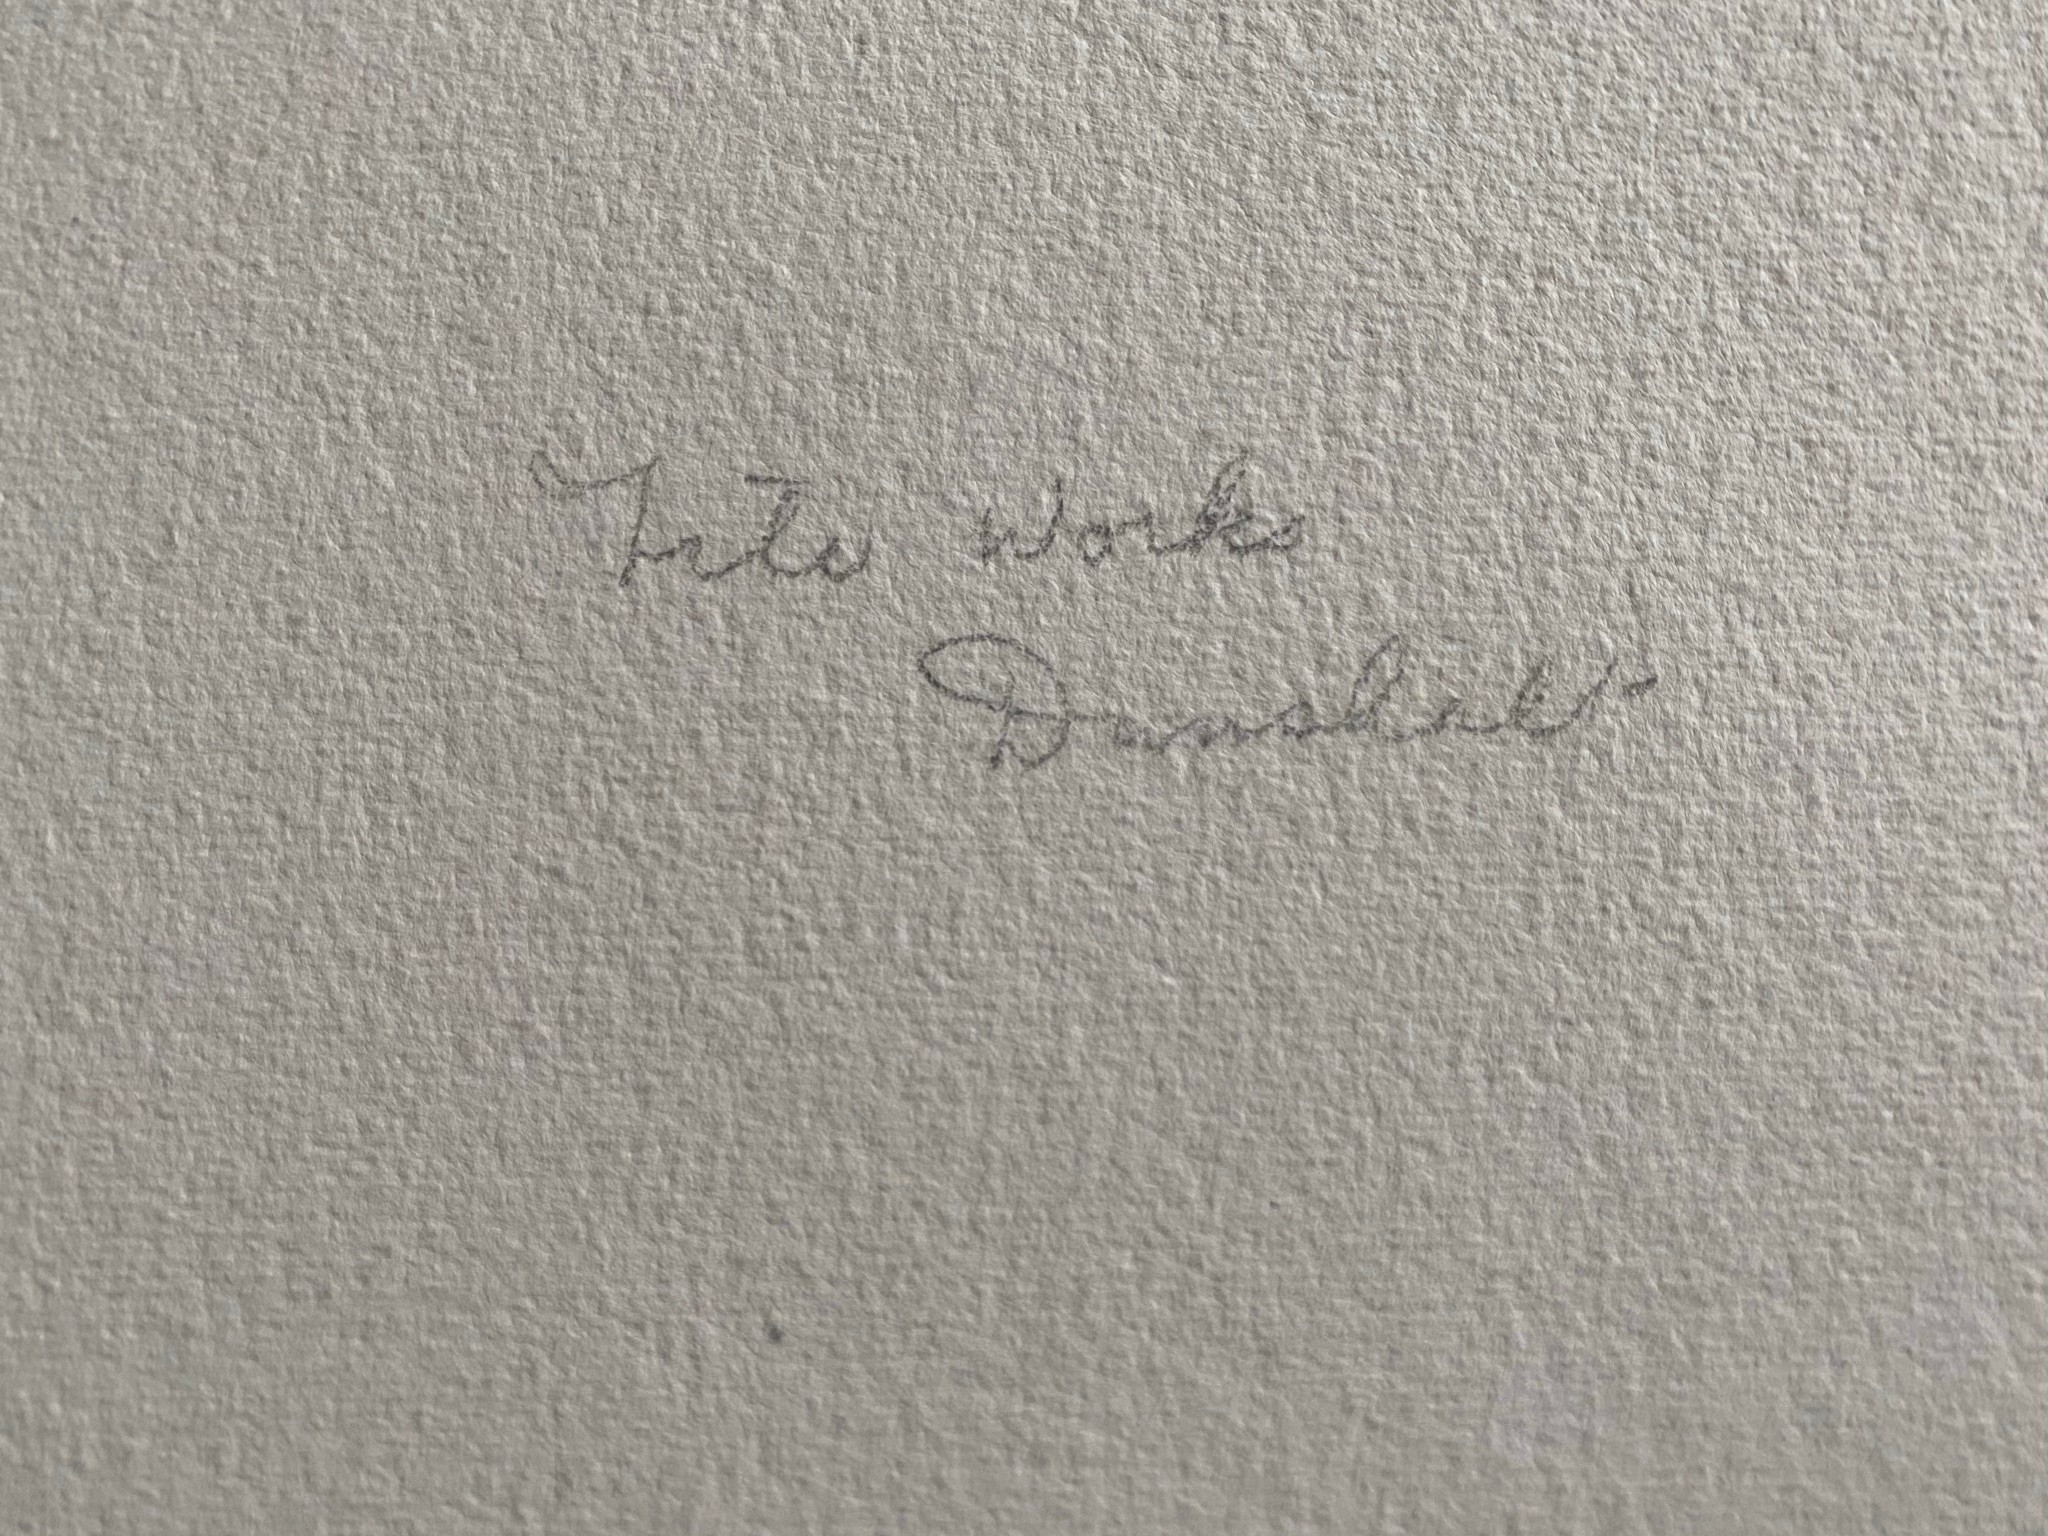 Watercolour signed G. M. Craig, (Gertrude Mary) Tile Works Dunshalt - Image 4 of 4